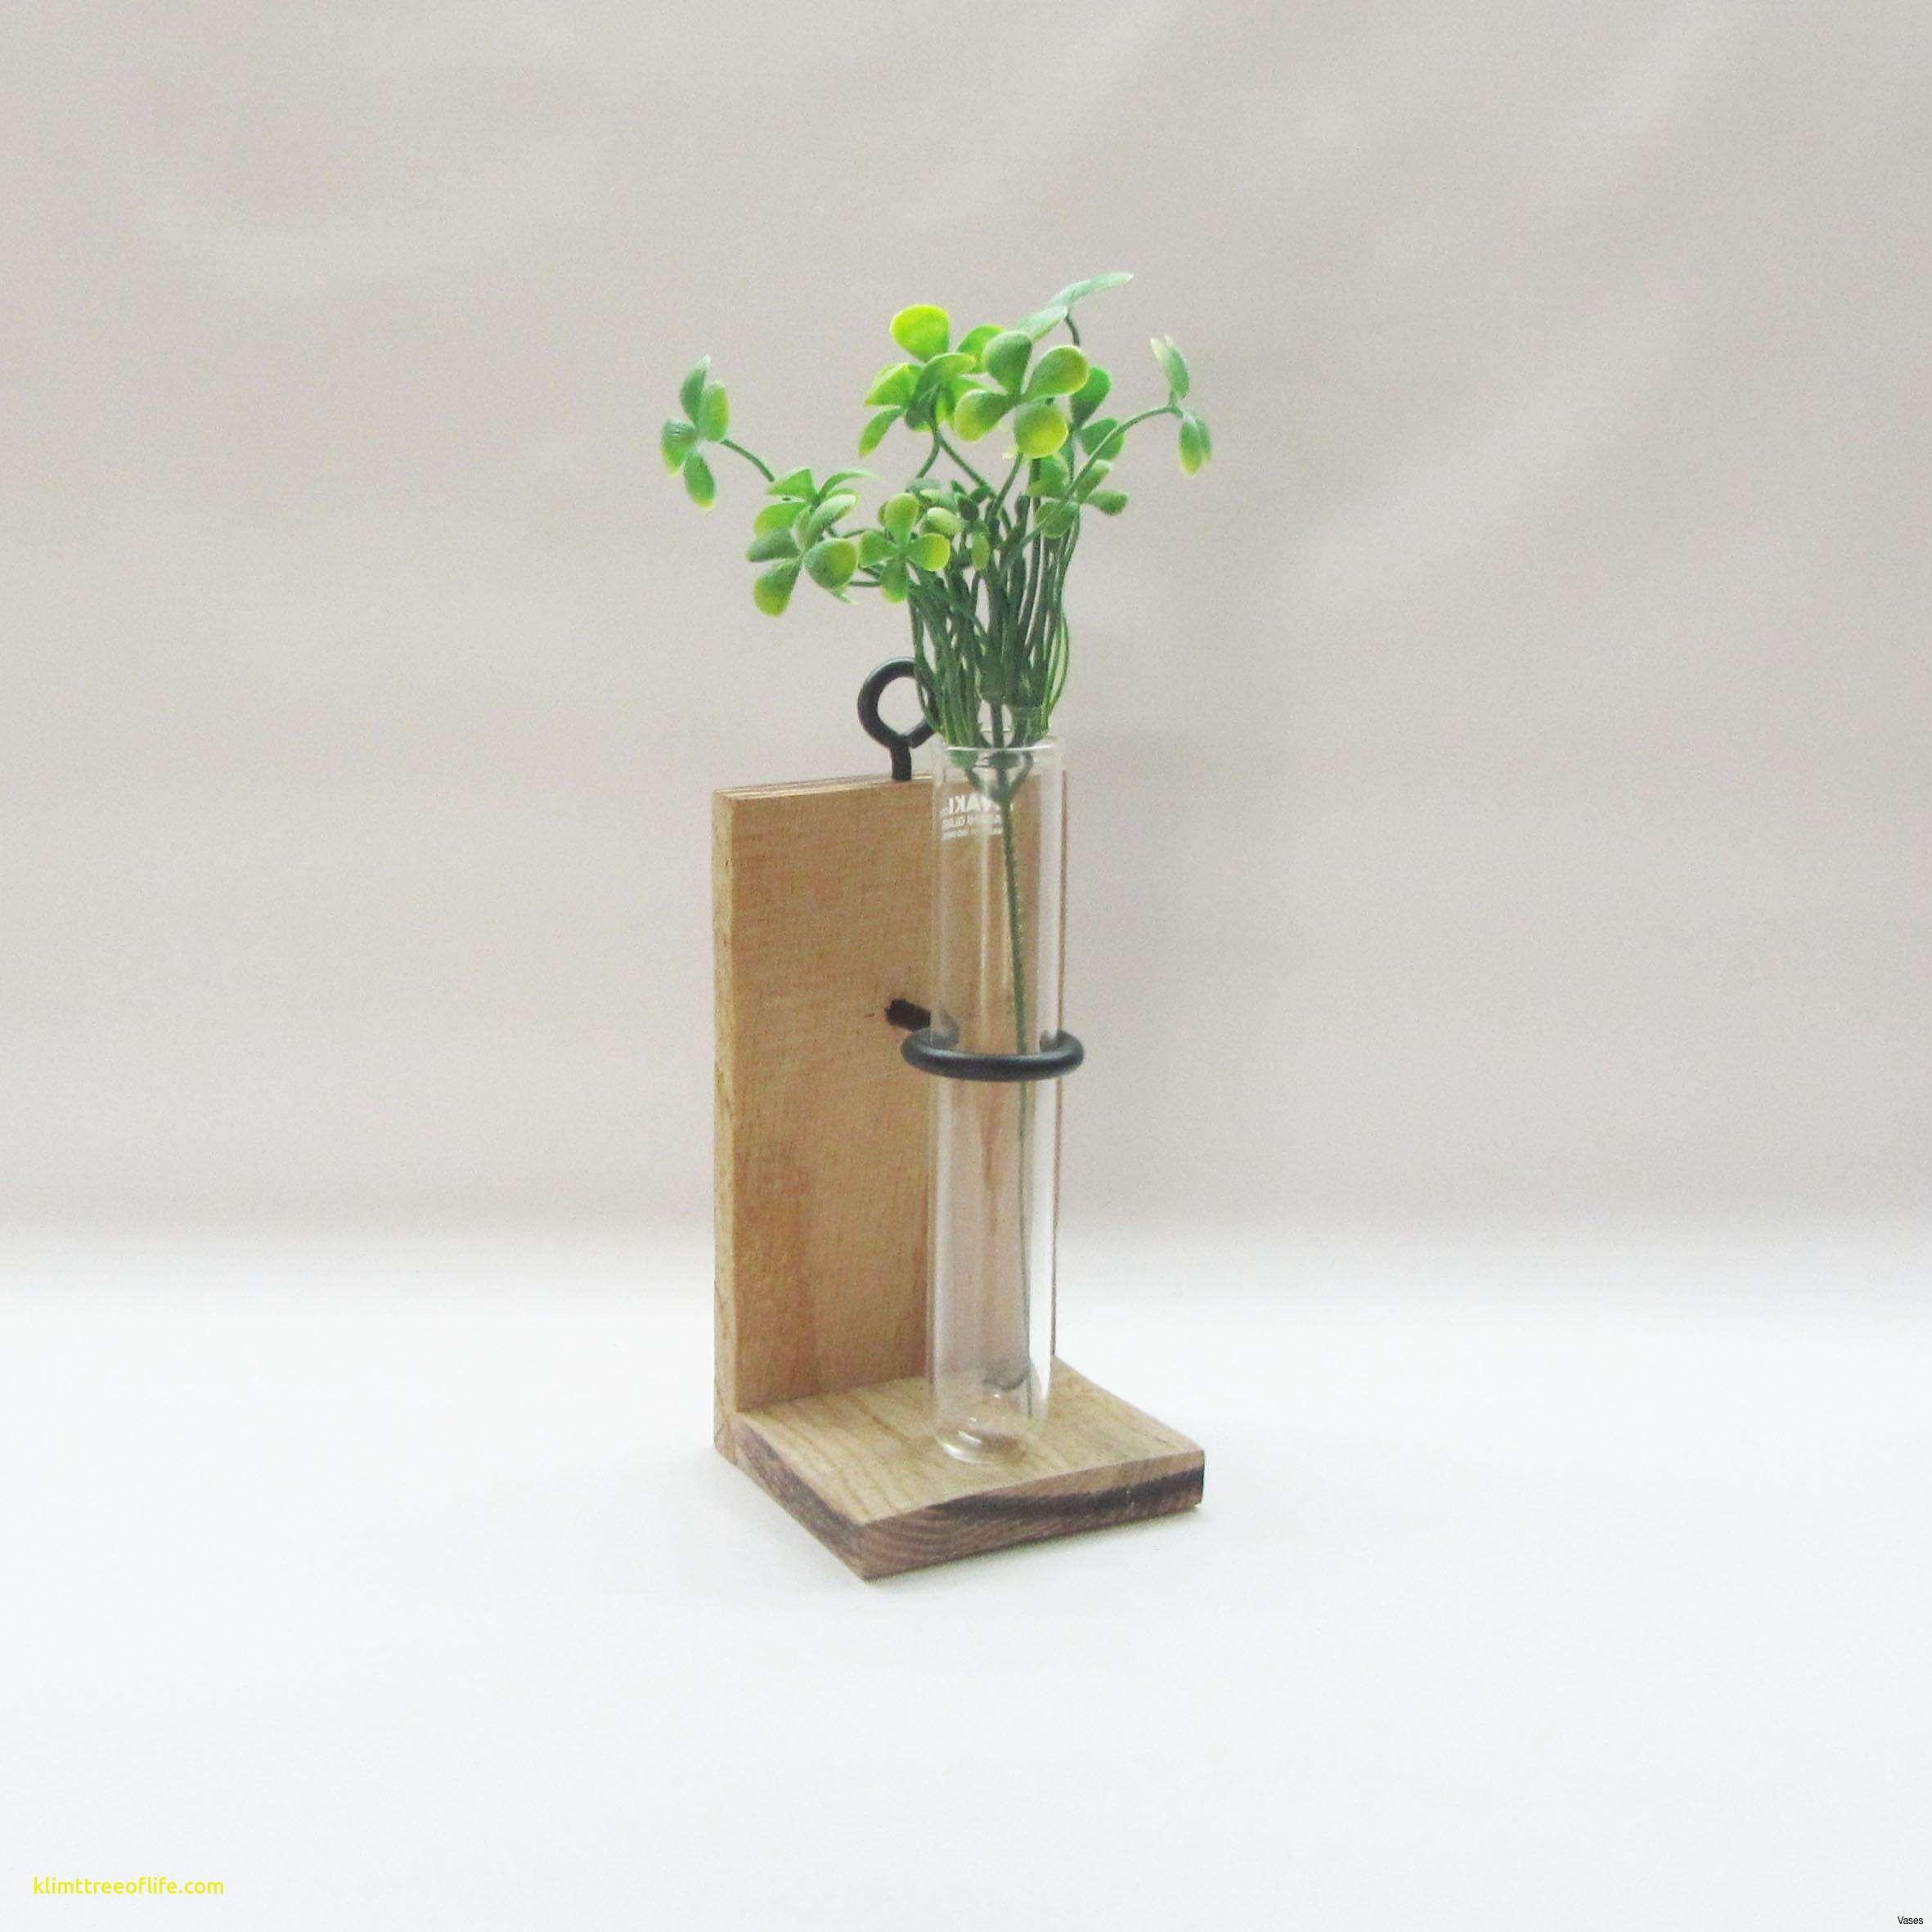 ikea glass flower vases of wooden table vases awesome ikea white desk encourage minimalist pertaining to ikea white desk encourage minimalist corner desk setup ikea linnmon